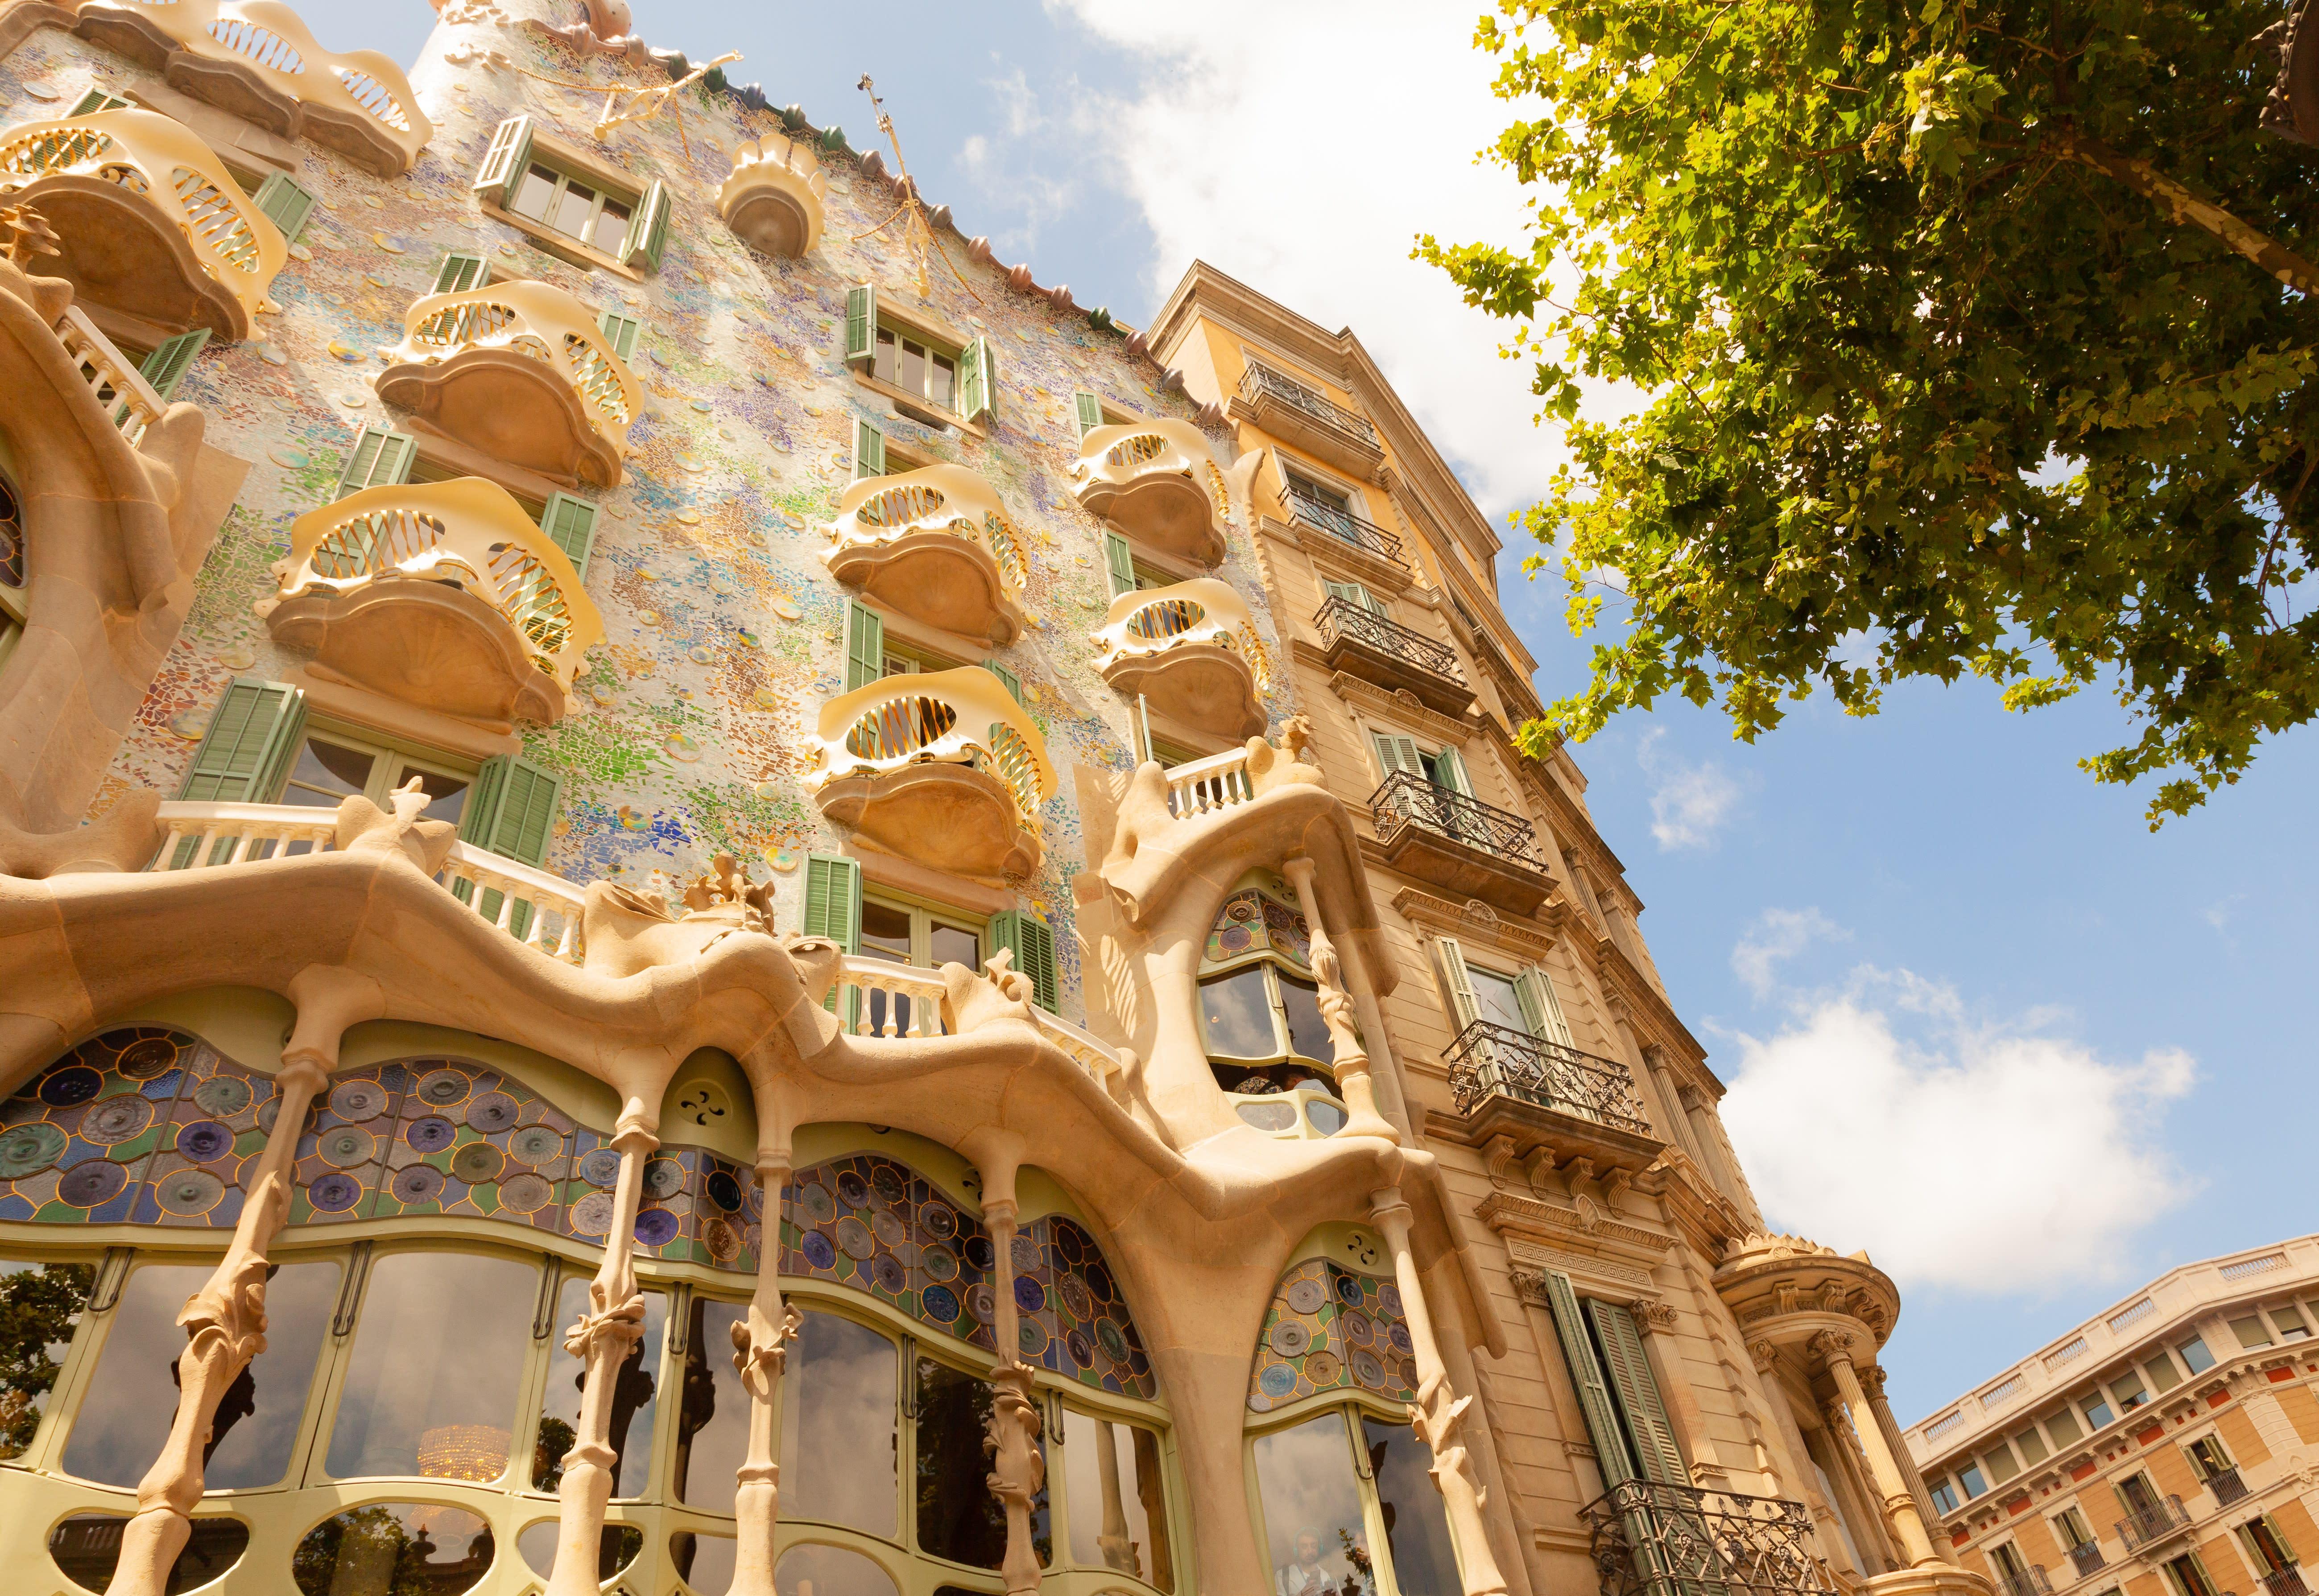 2.-Gaudi-Photo-by-Duncan-Kidd-on-Unsplash